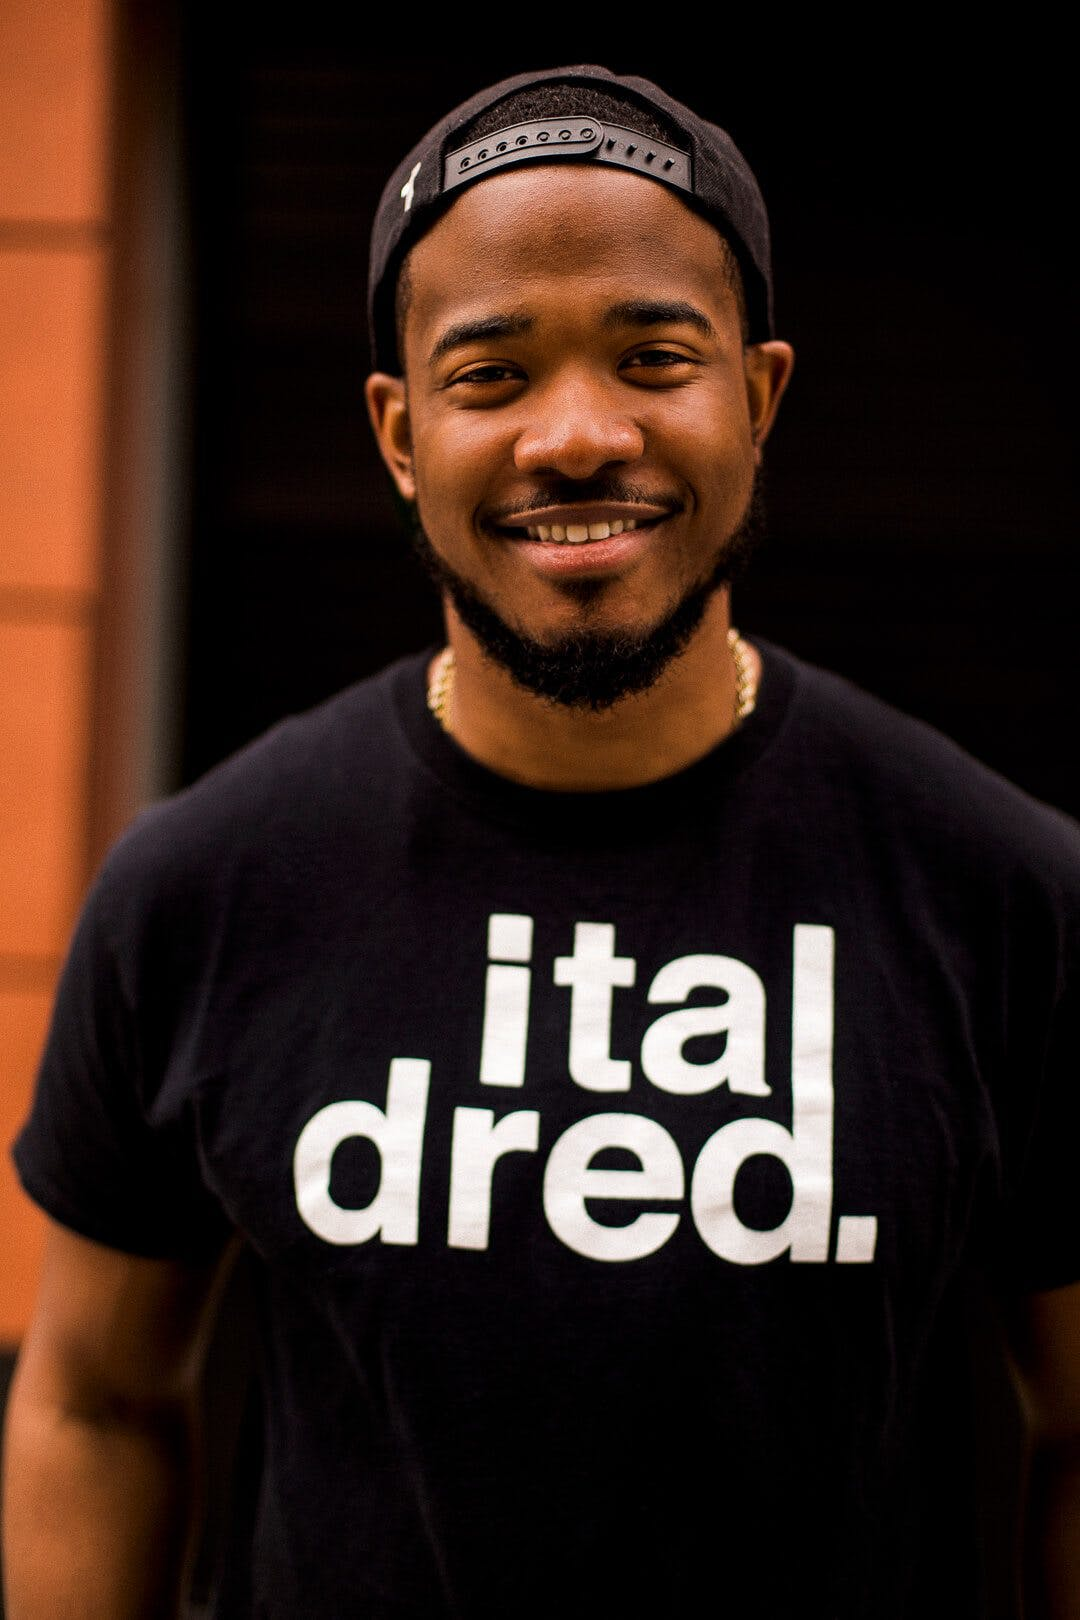 Smiling Man Wearing Black Snapback Cap and Black Crew-neck Shirt